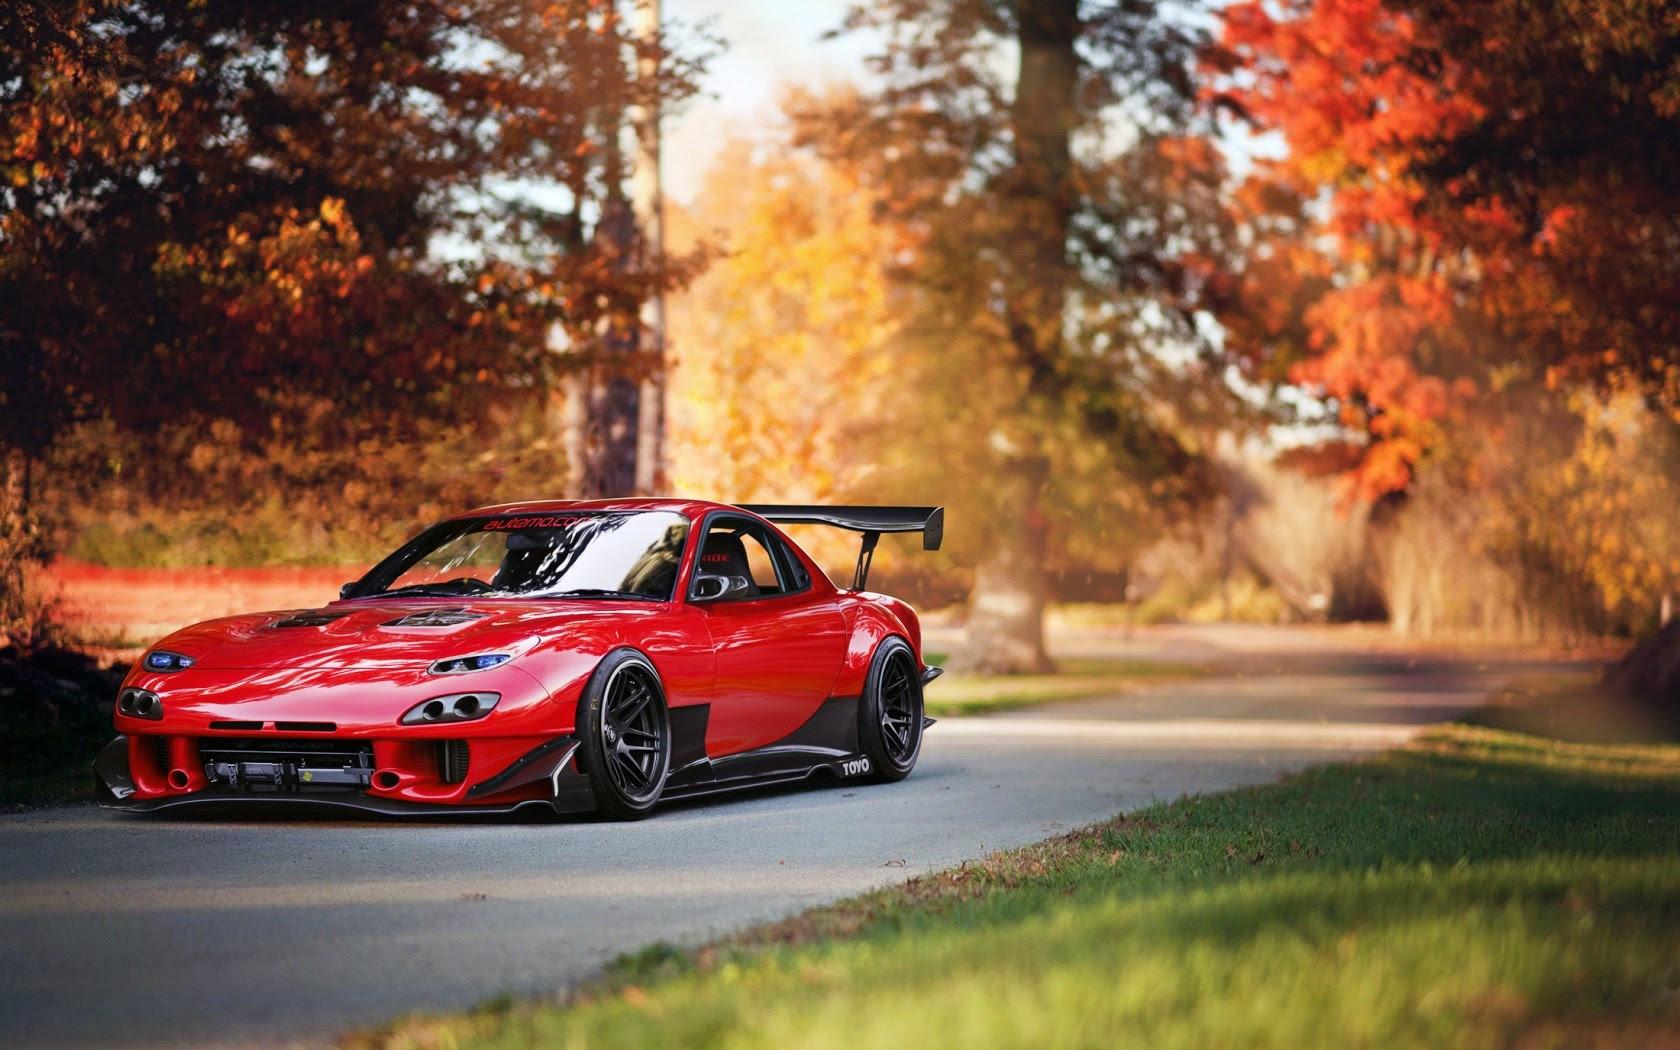 Mazda RX7 Car Red Tuning wallpaper  1680x1050  17341